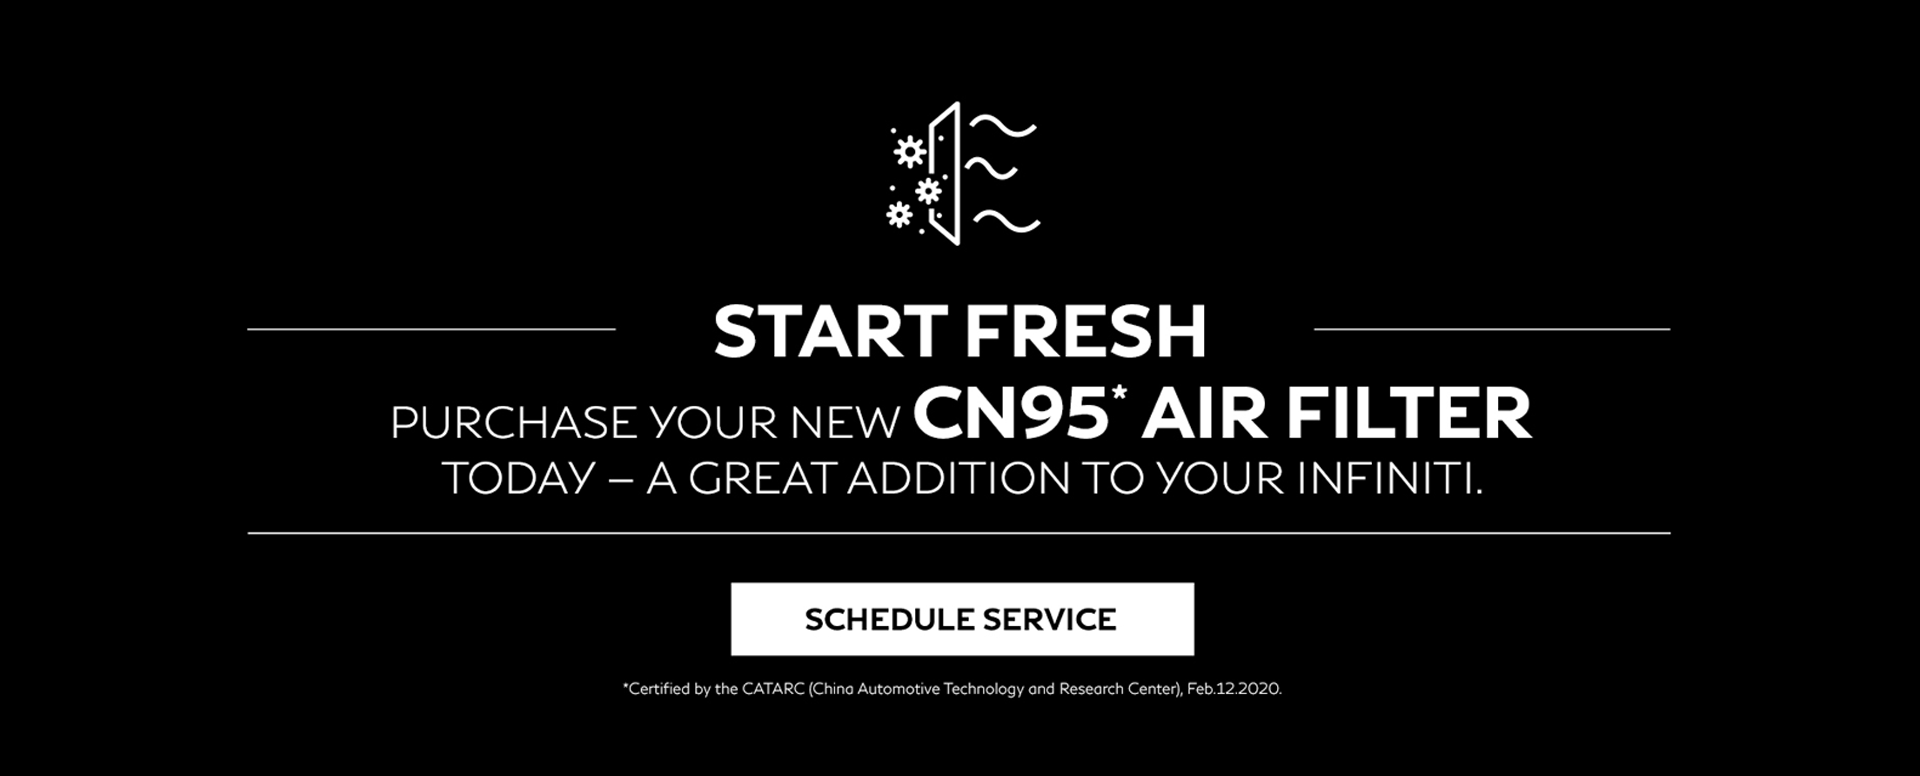 CN95 Air Filter. Click to schedule service.